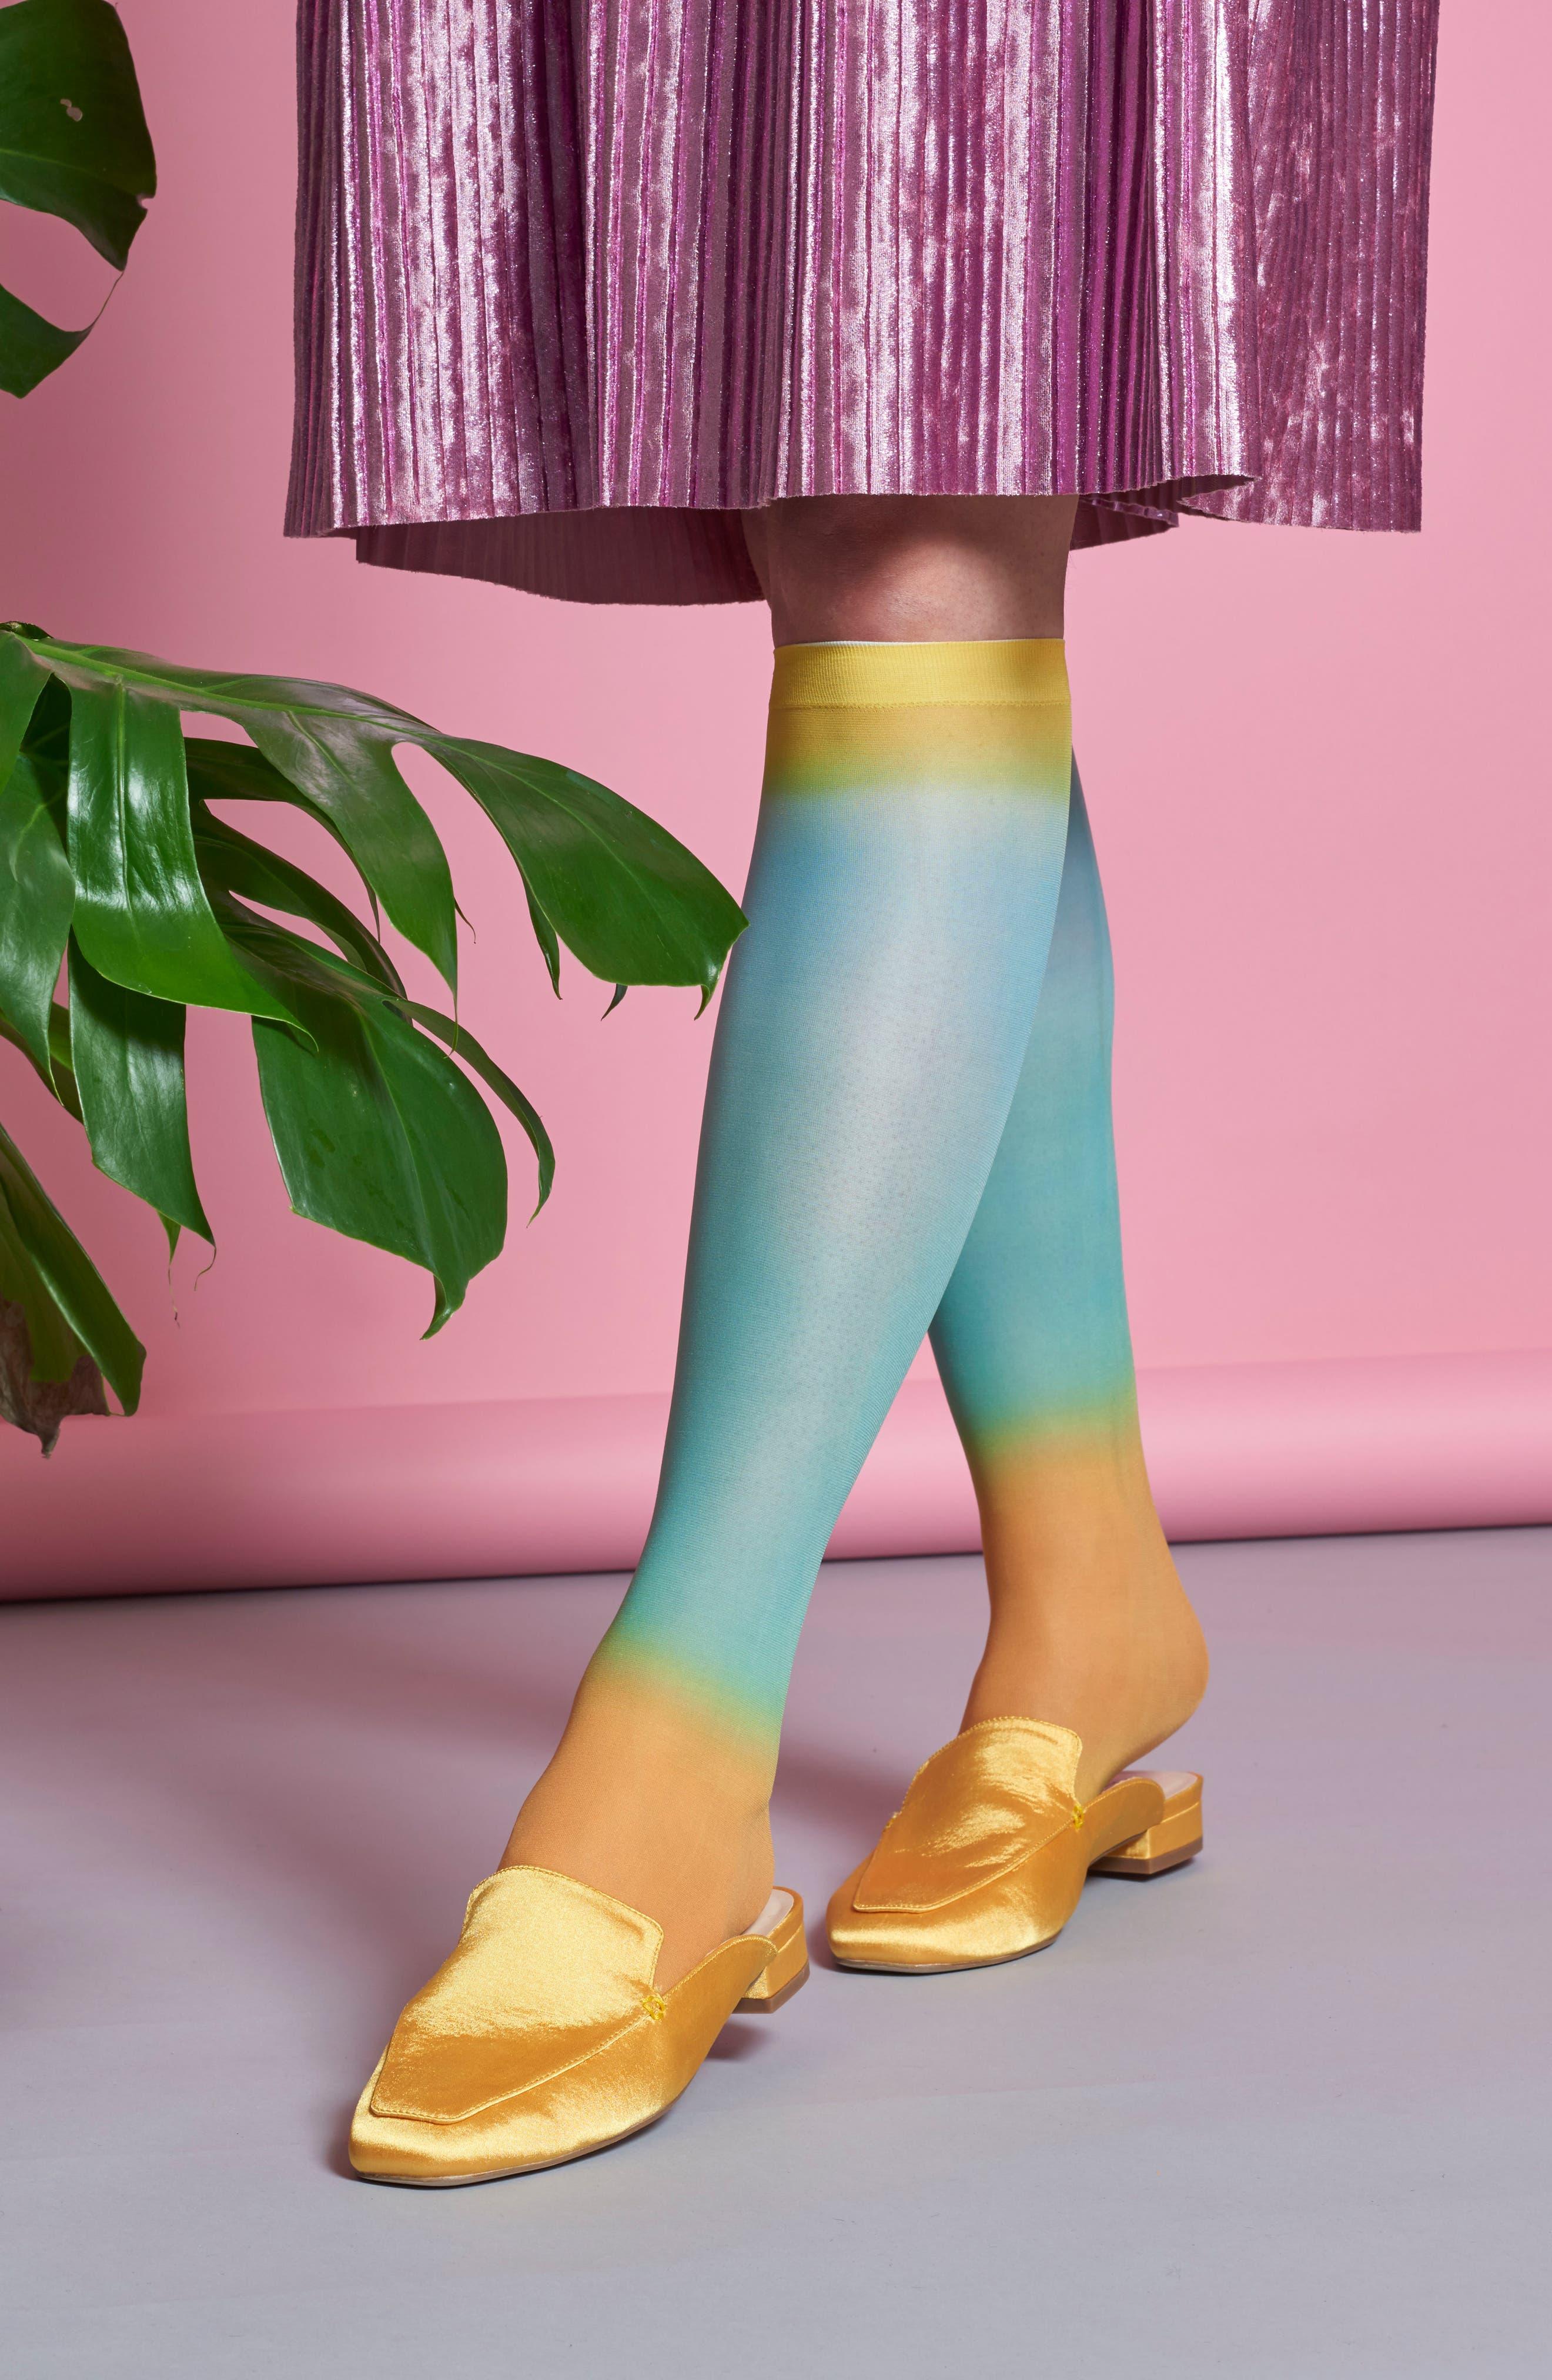 HYSTERIA BY HAPPY SOCKS,                             Mia Print Knee High Socks,                             Alternate thumbnail 4, color,                             449